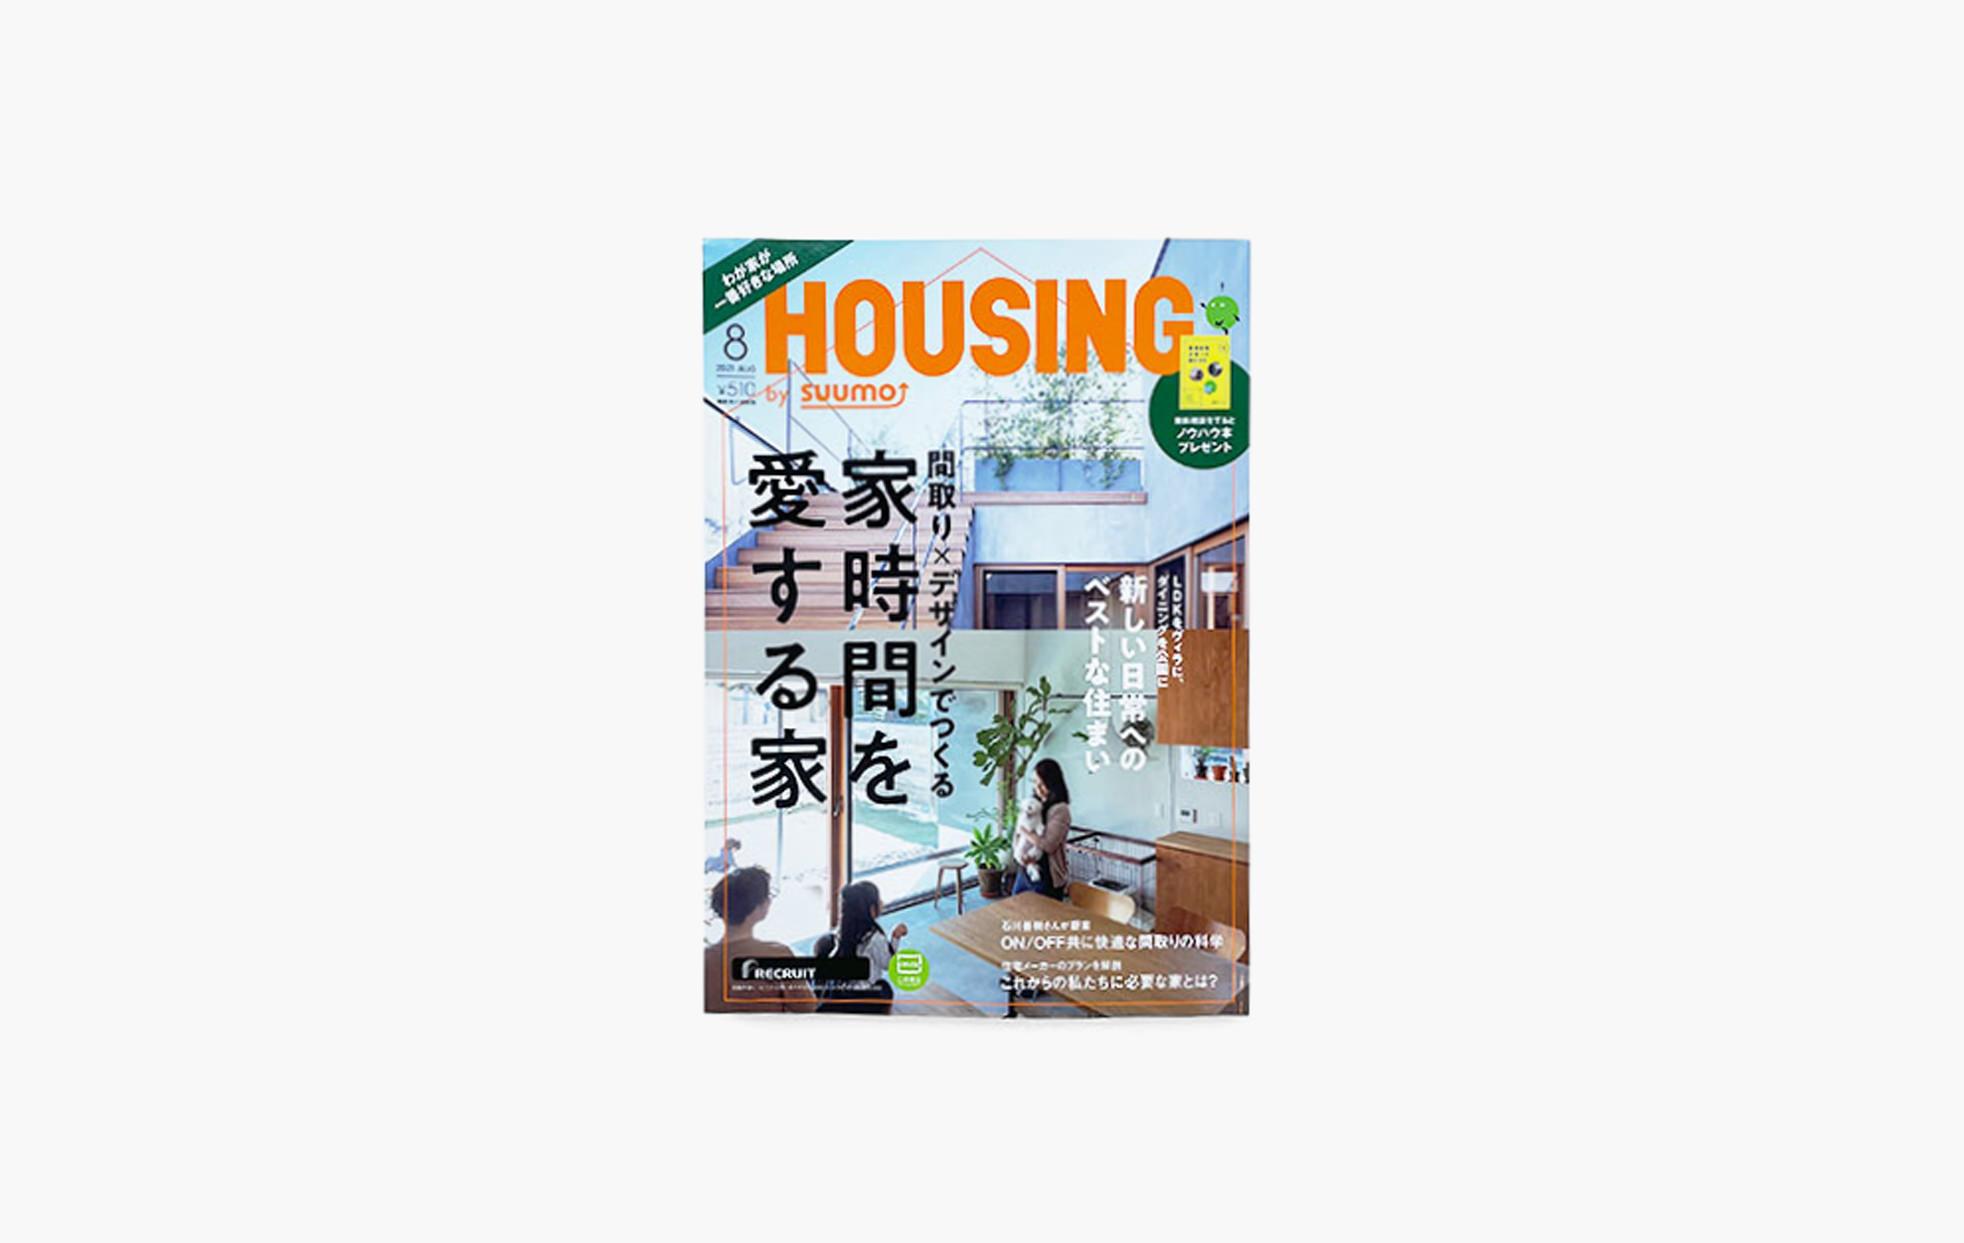 HOUSING by SUUMO